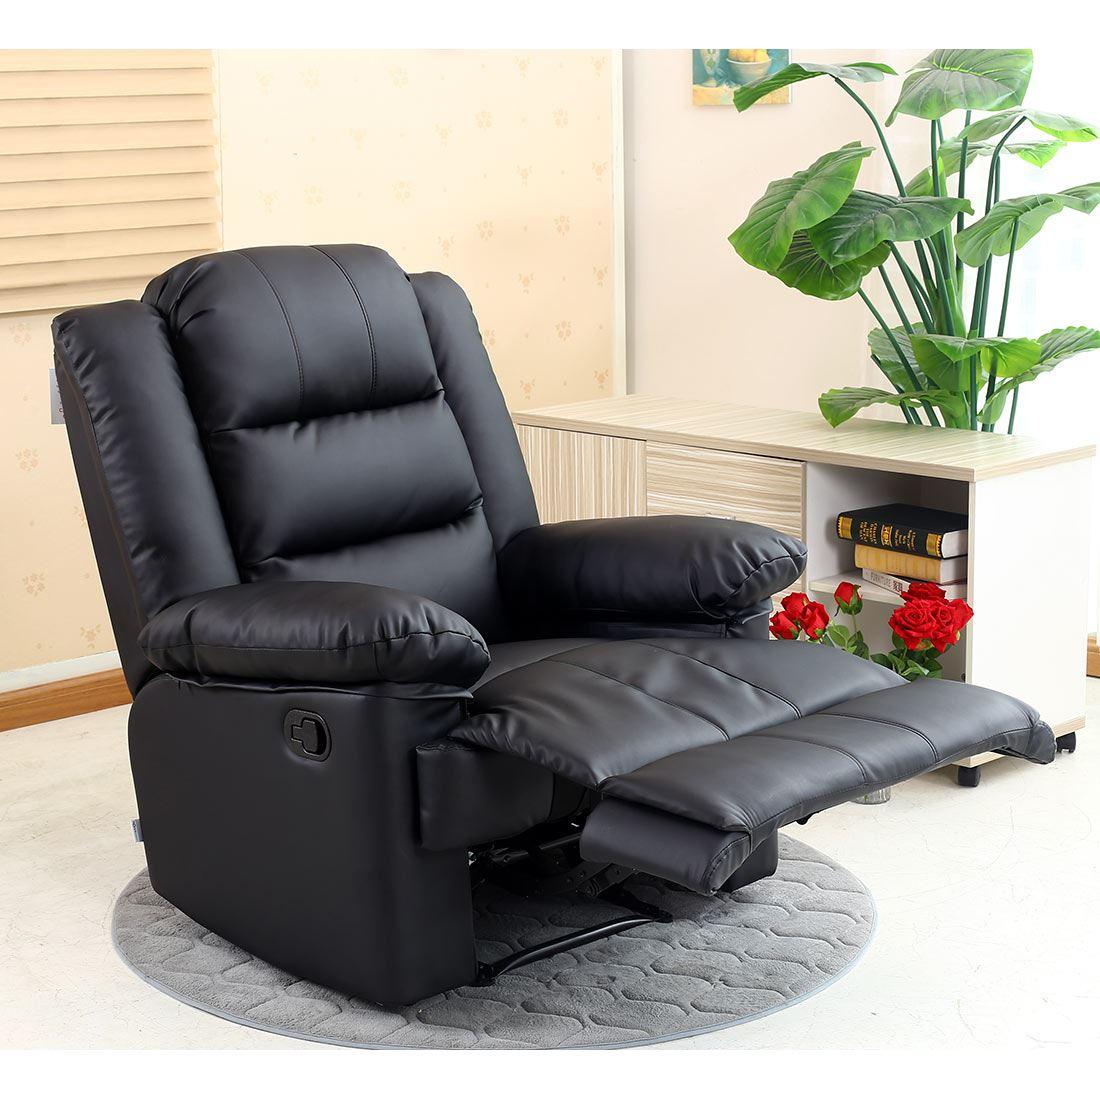 Leather Furniture In Nigeria Aba Zion Star